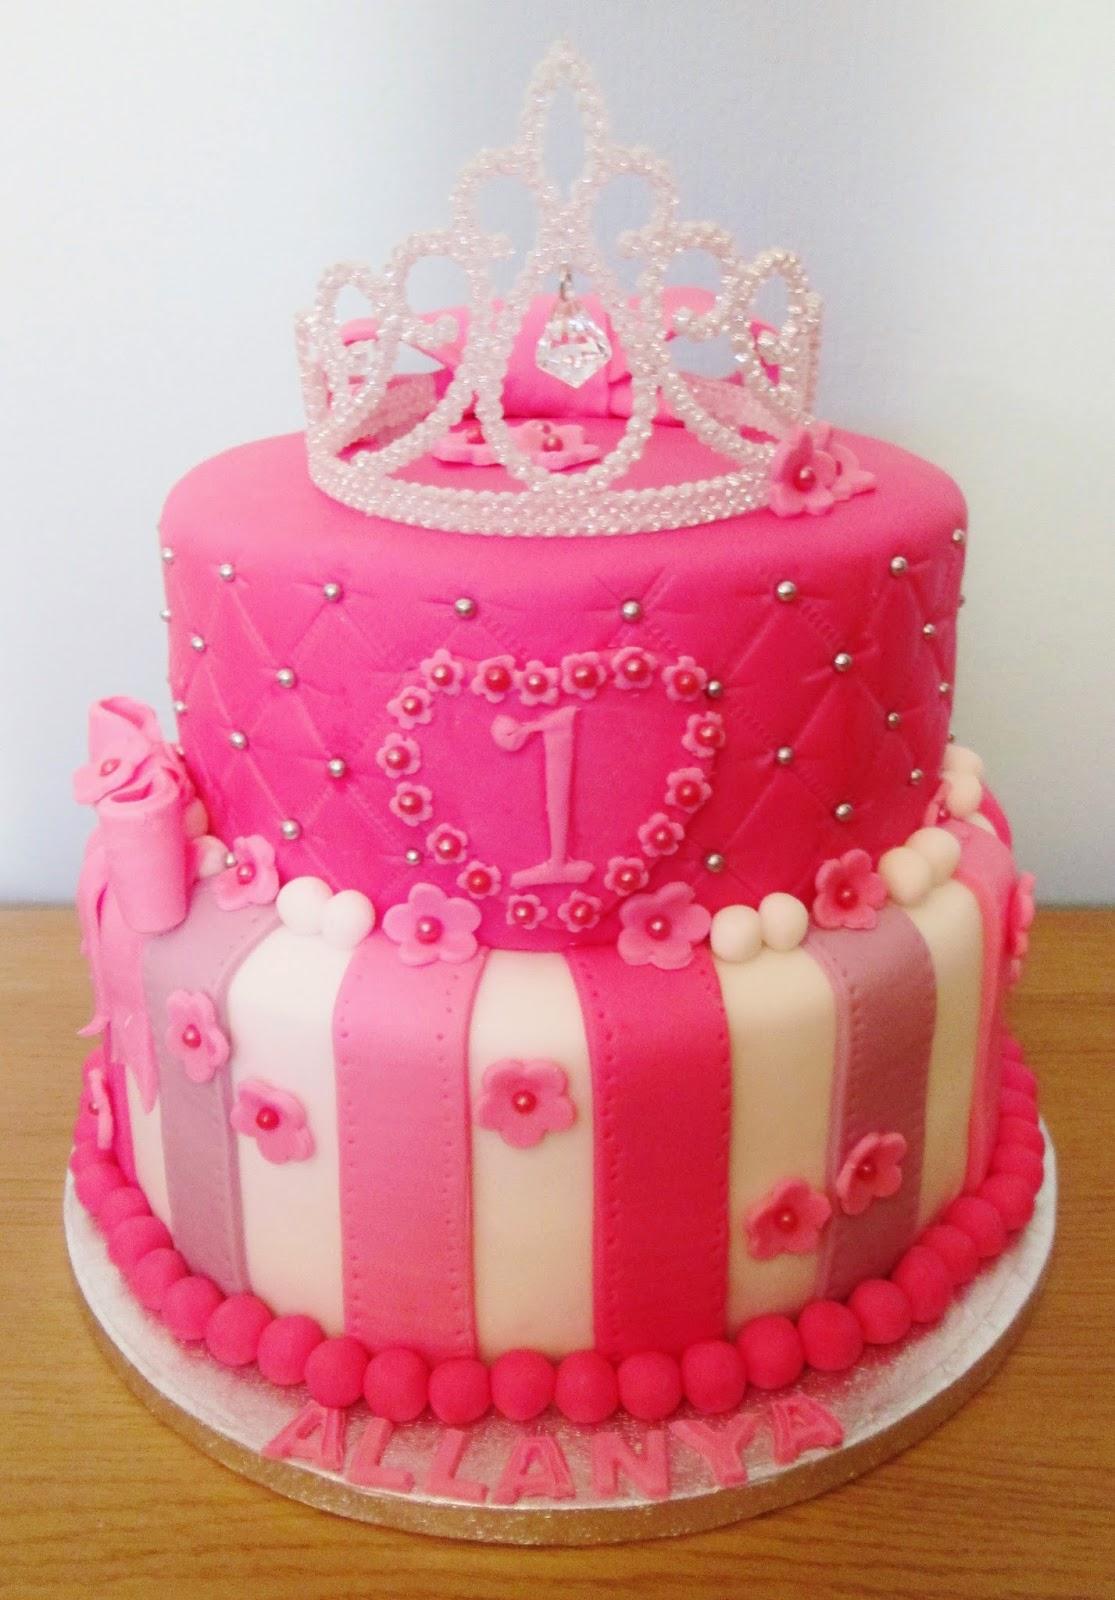 http://themessykitchenuk.blogspot.co.uk/2013/12/two-tier-birthday-cake.html